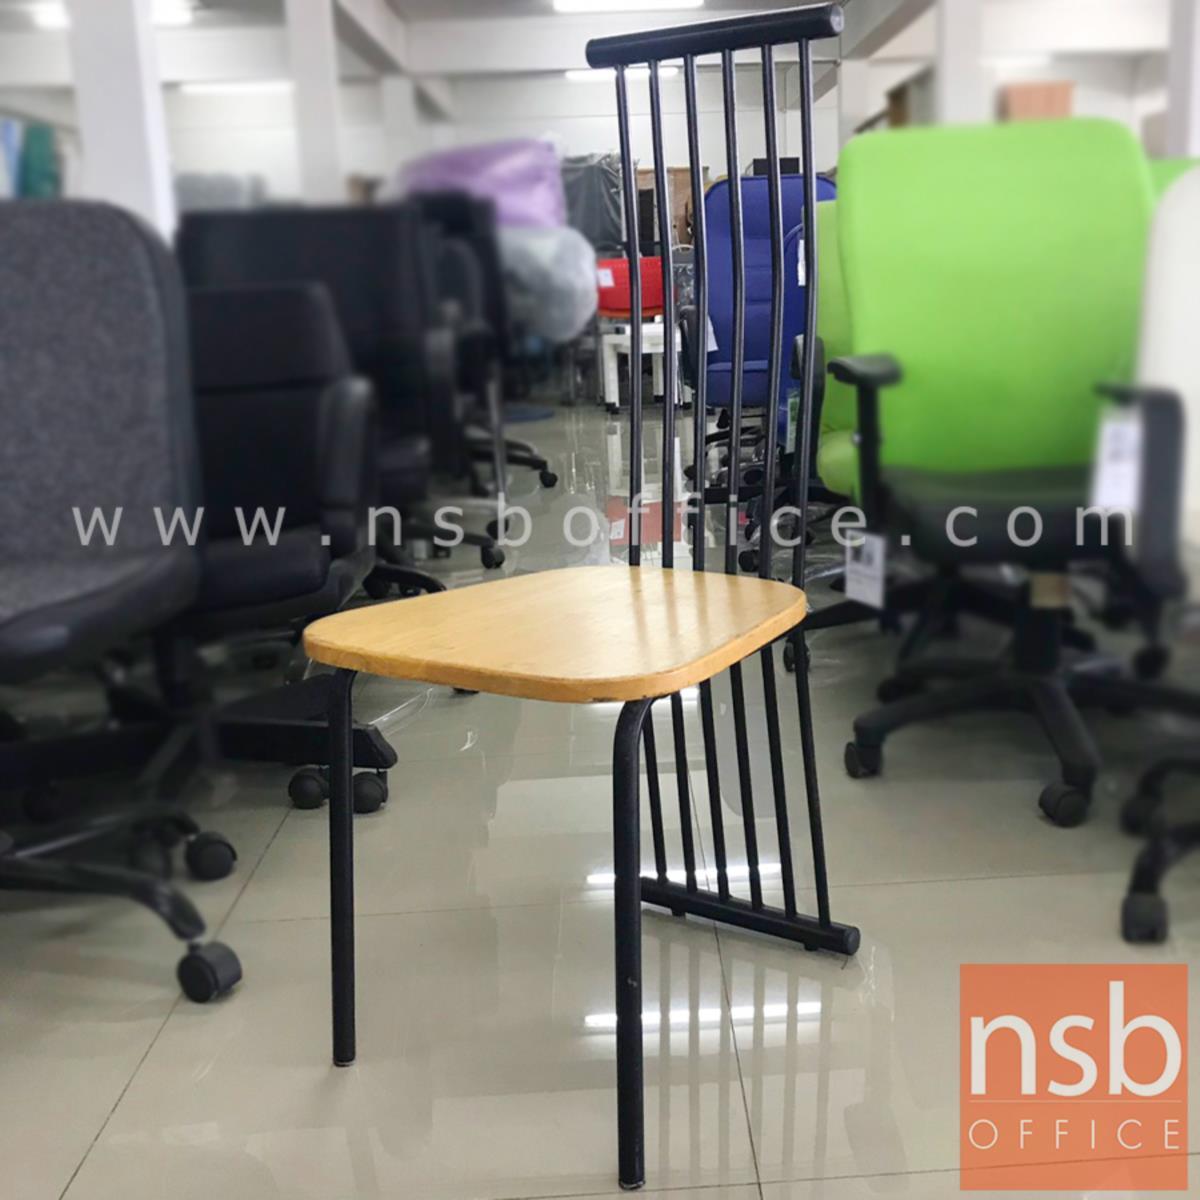 L02A289:เก้าอี้ไม้ รุ่น NSB-CHAIR4 ขนาด 42W*101H cm. โครงเหล็กพ่นดำ (STOCK-1 ตัว)